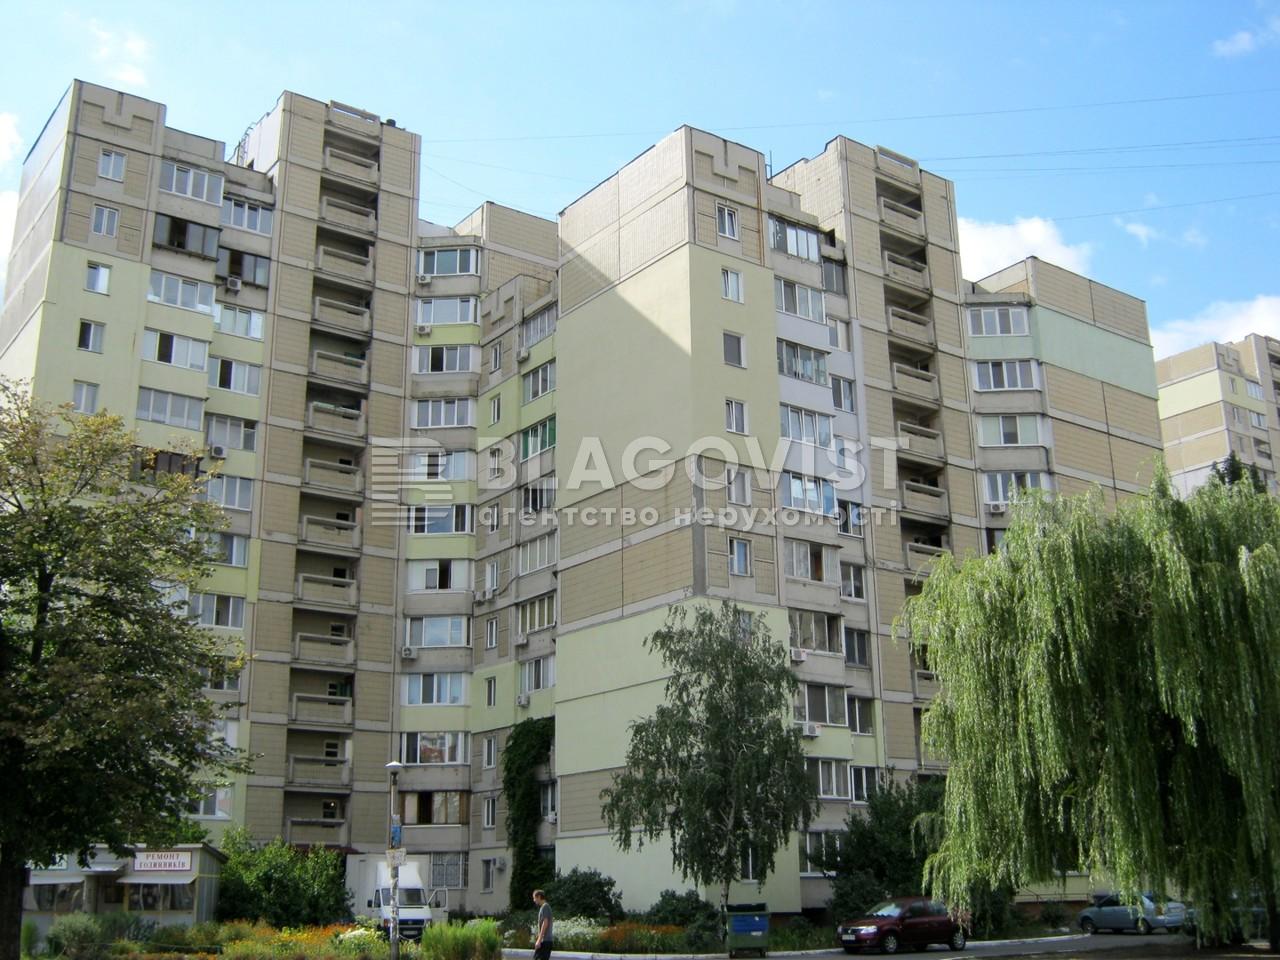 Квартира G-13957, Декабристов, 10, Киев - Фото 1